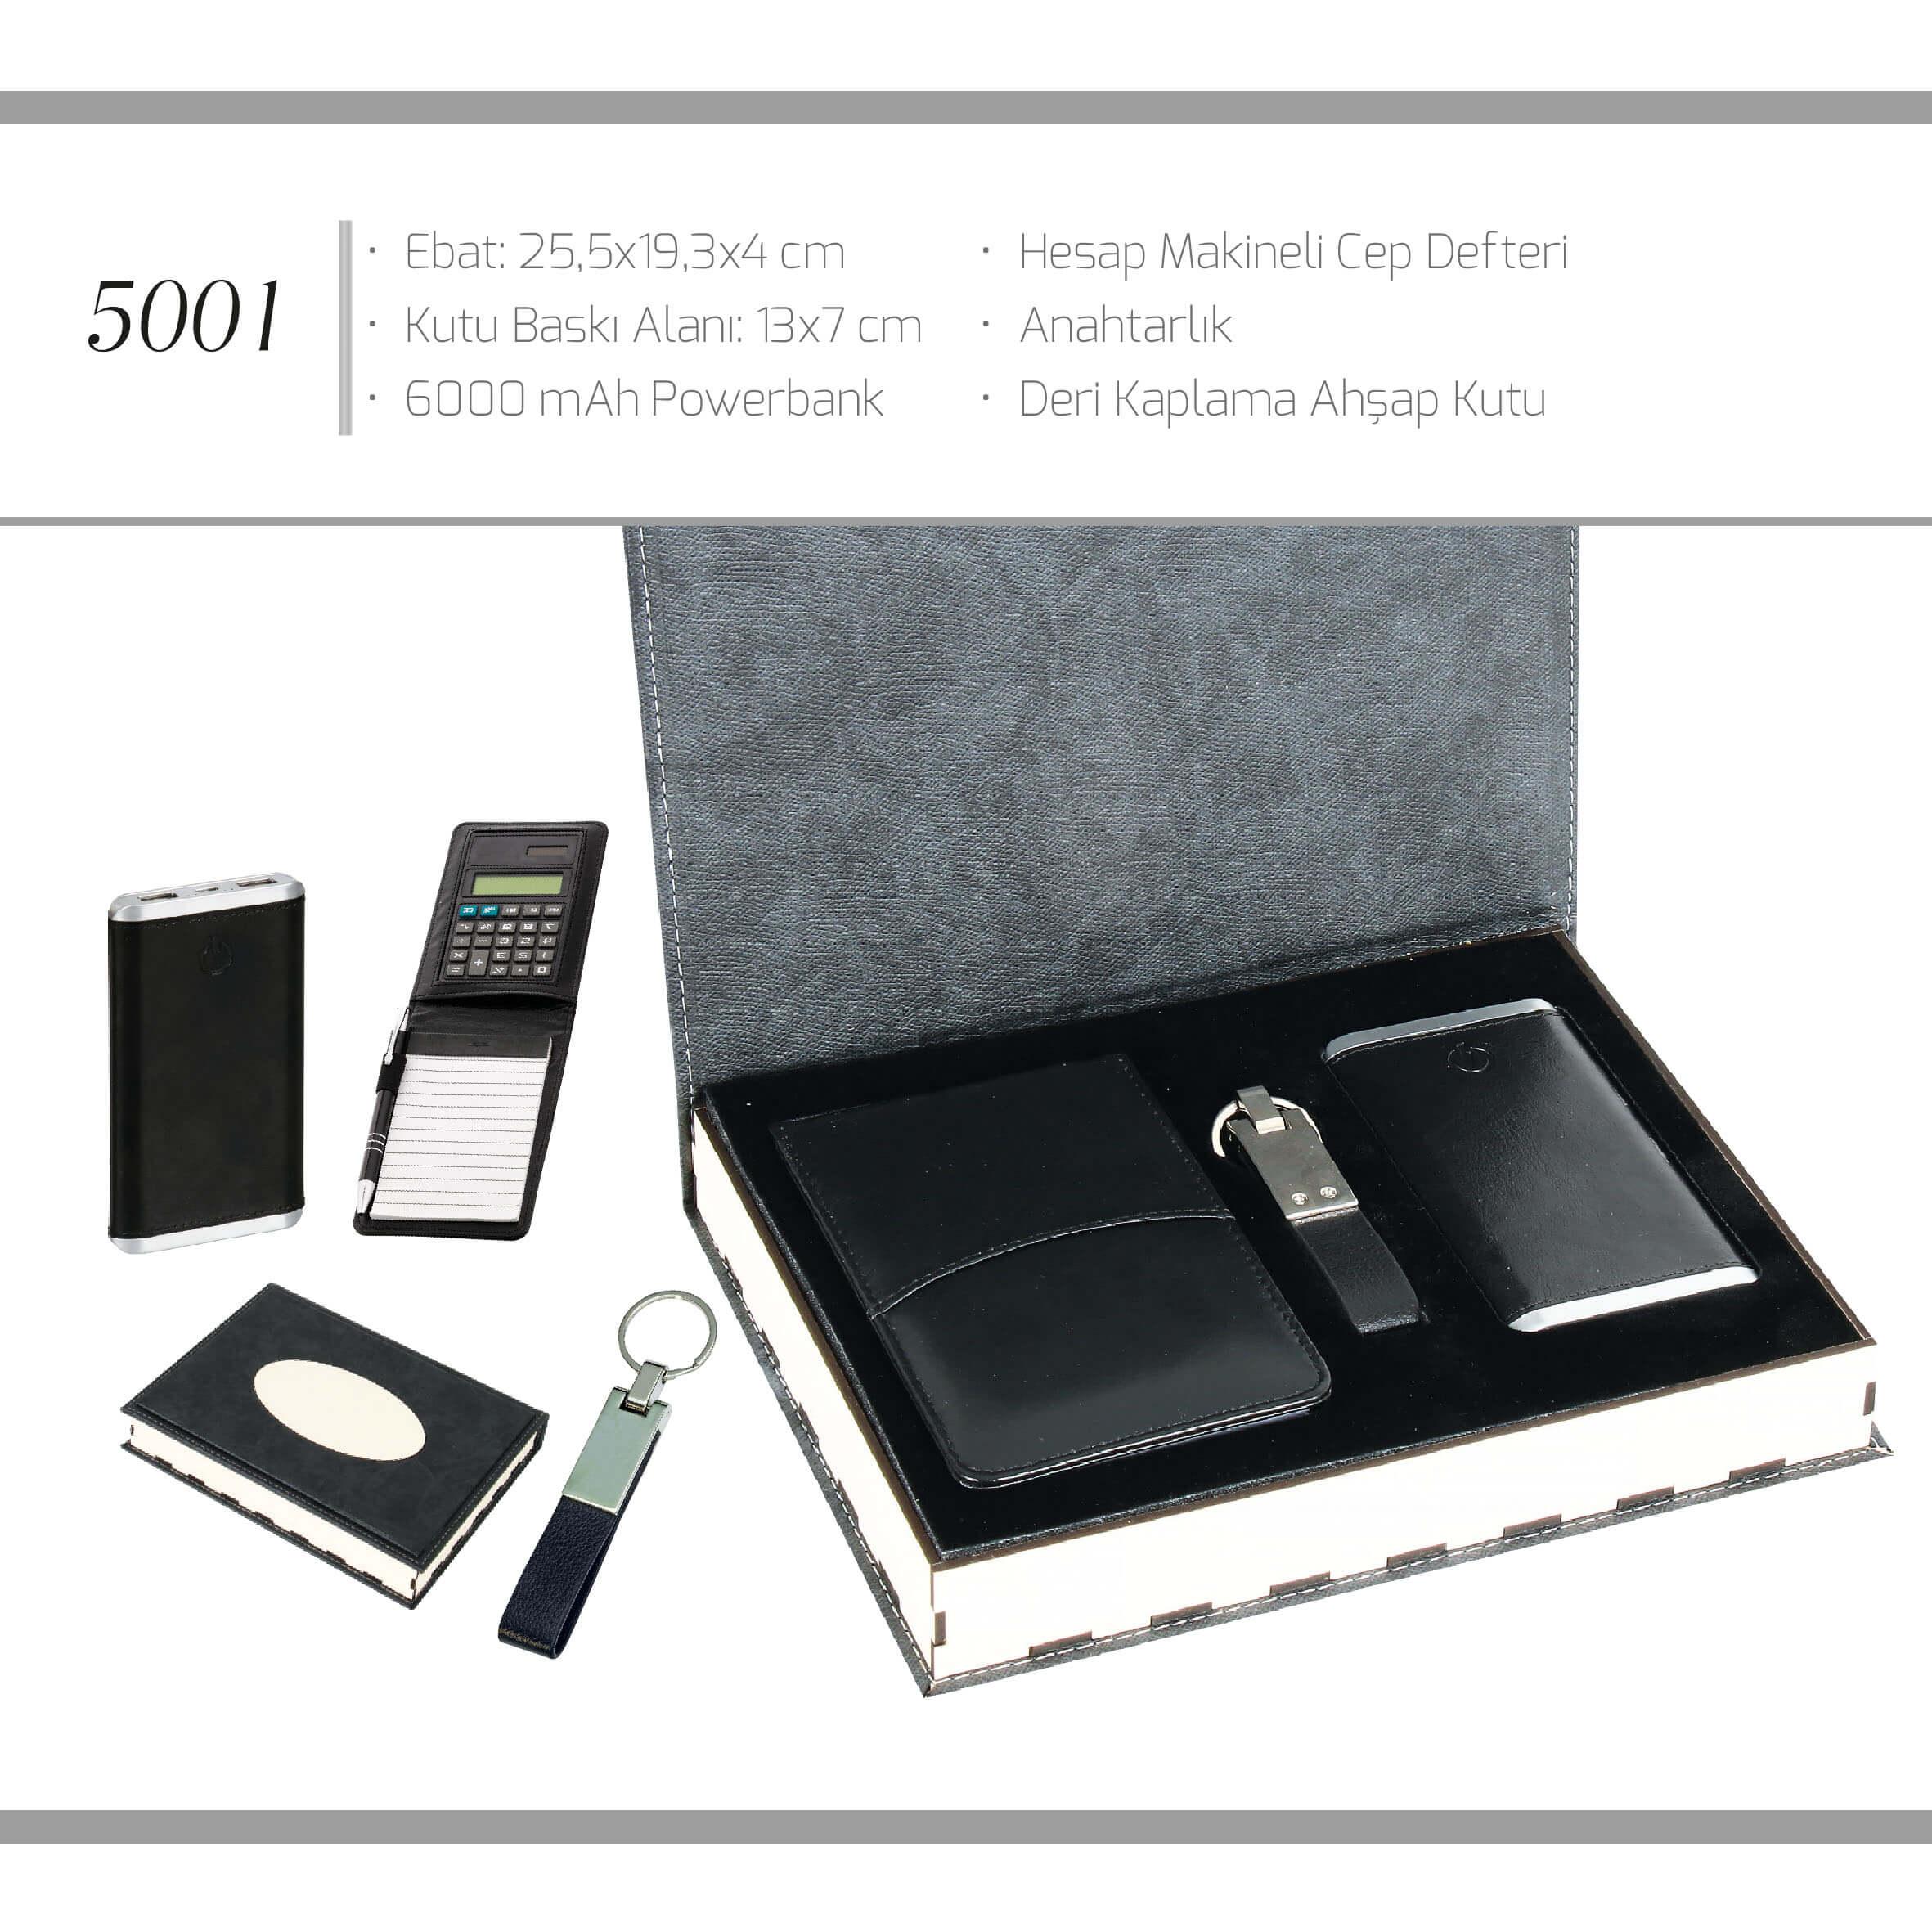 promosyon-promosyon ürünleri-VIP setler-promosyon 5001